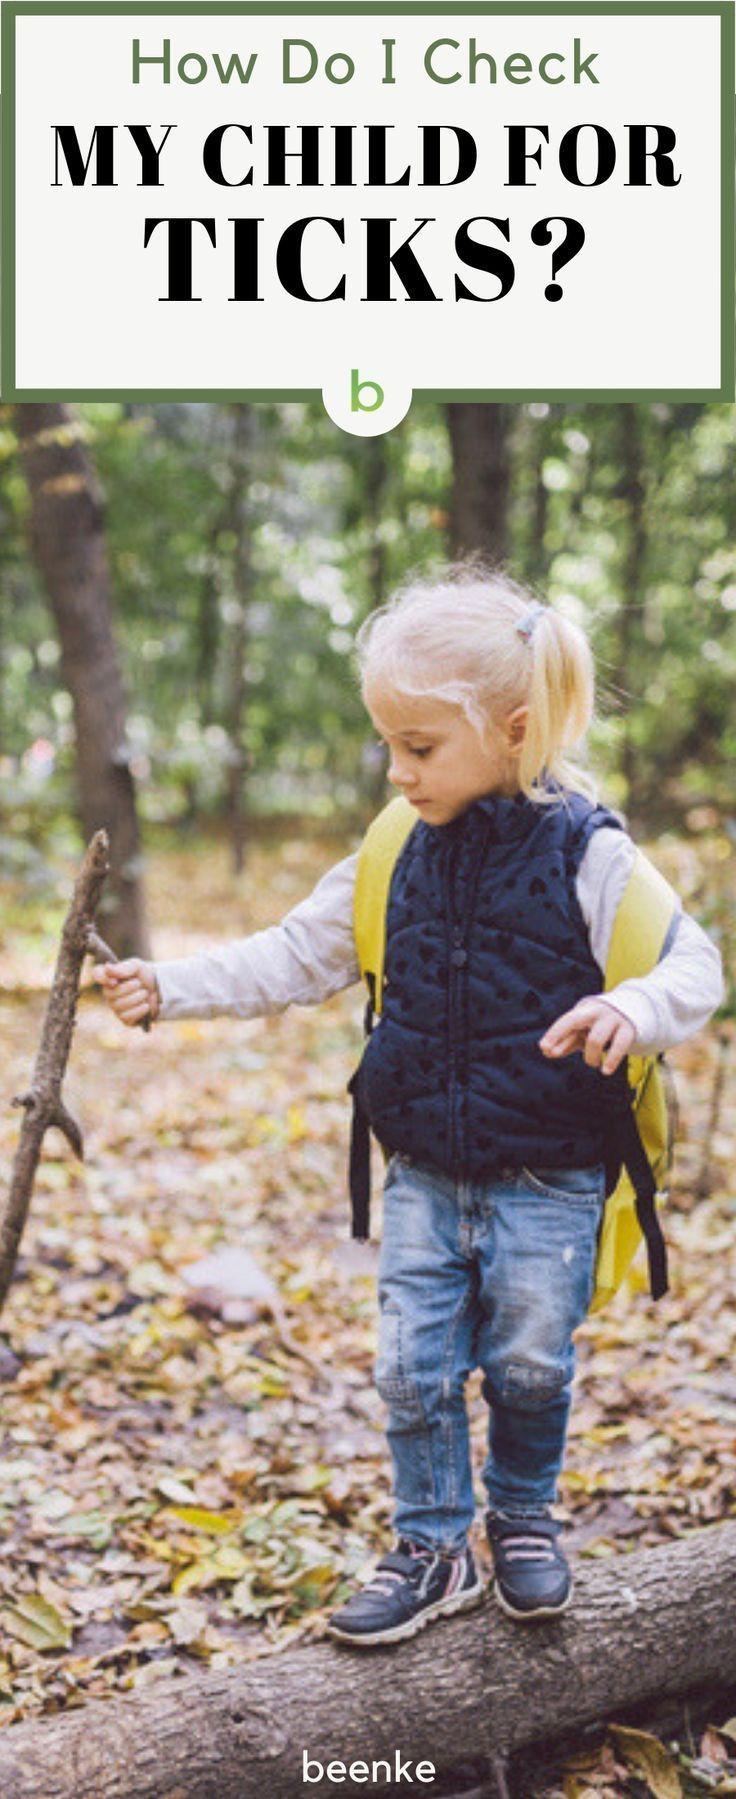 How do i check my child for ticks kids health children